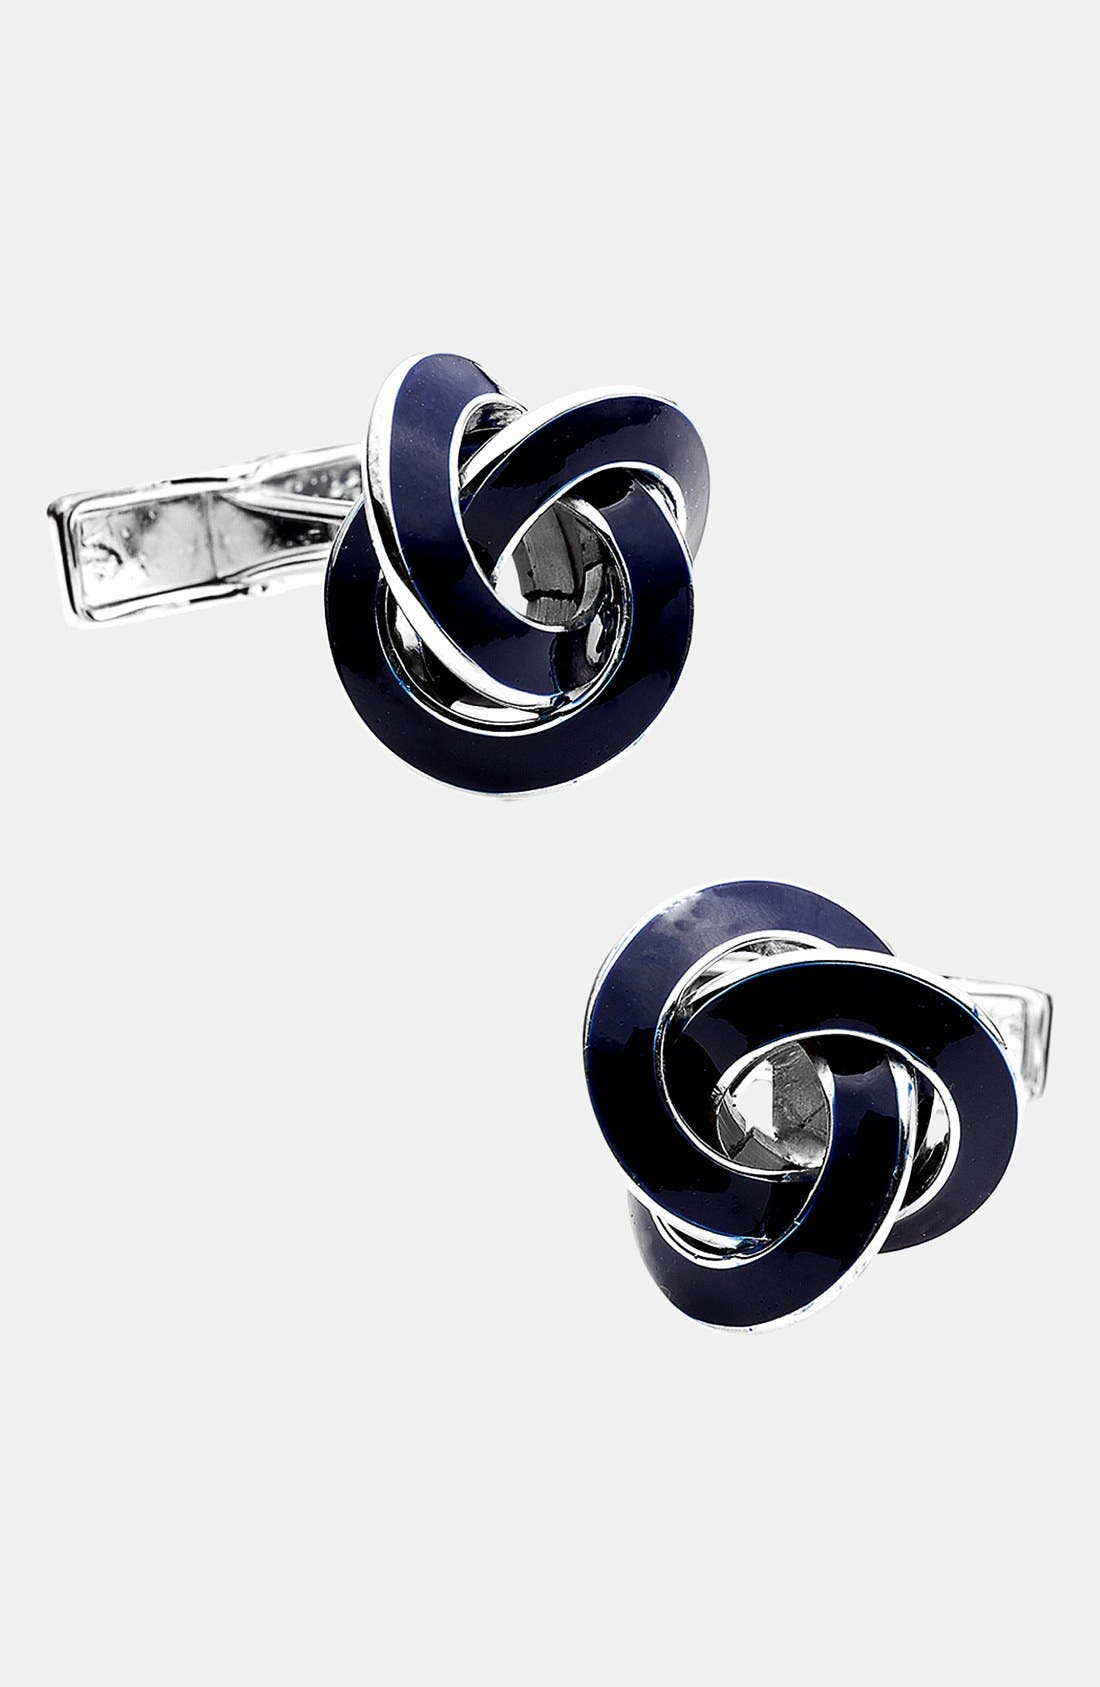 Alternate Image 1 Selected - Ravi Ratan 'Knot' Cuff Links